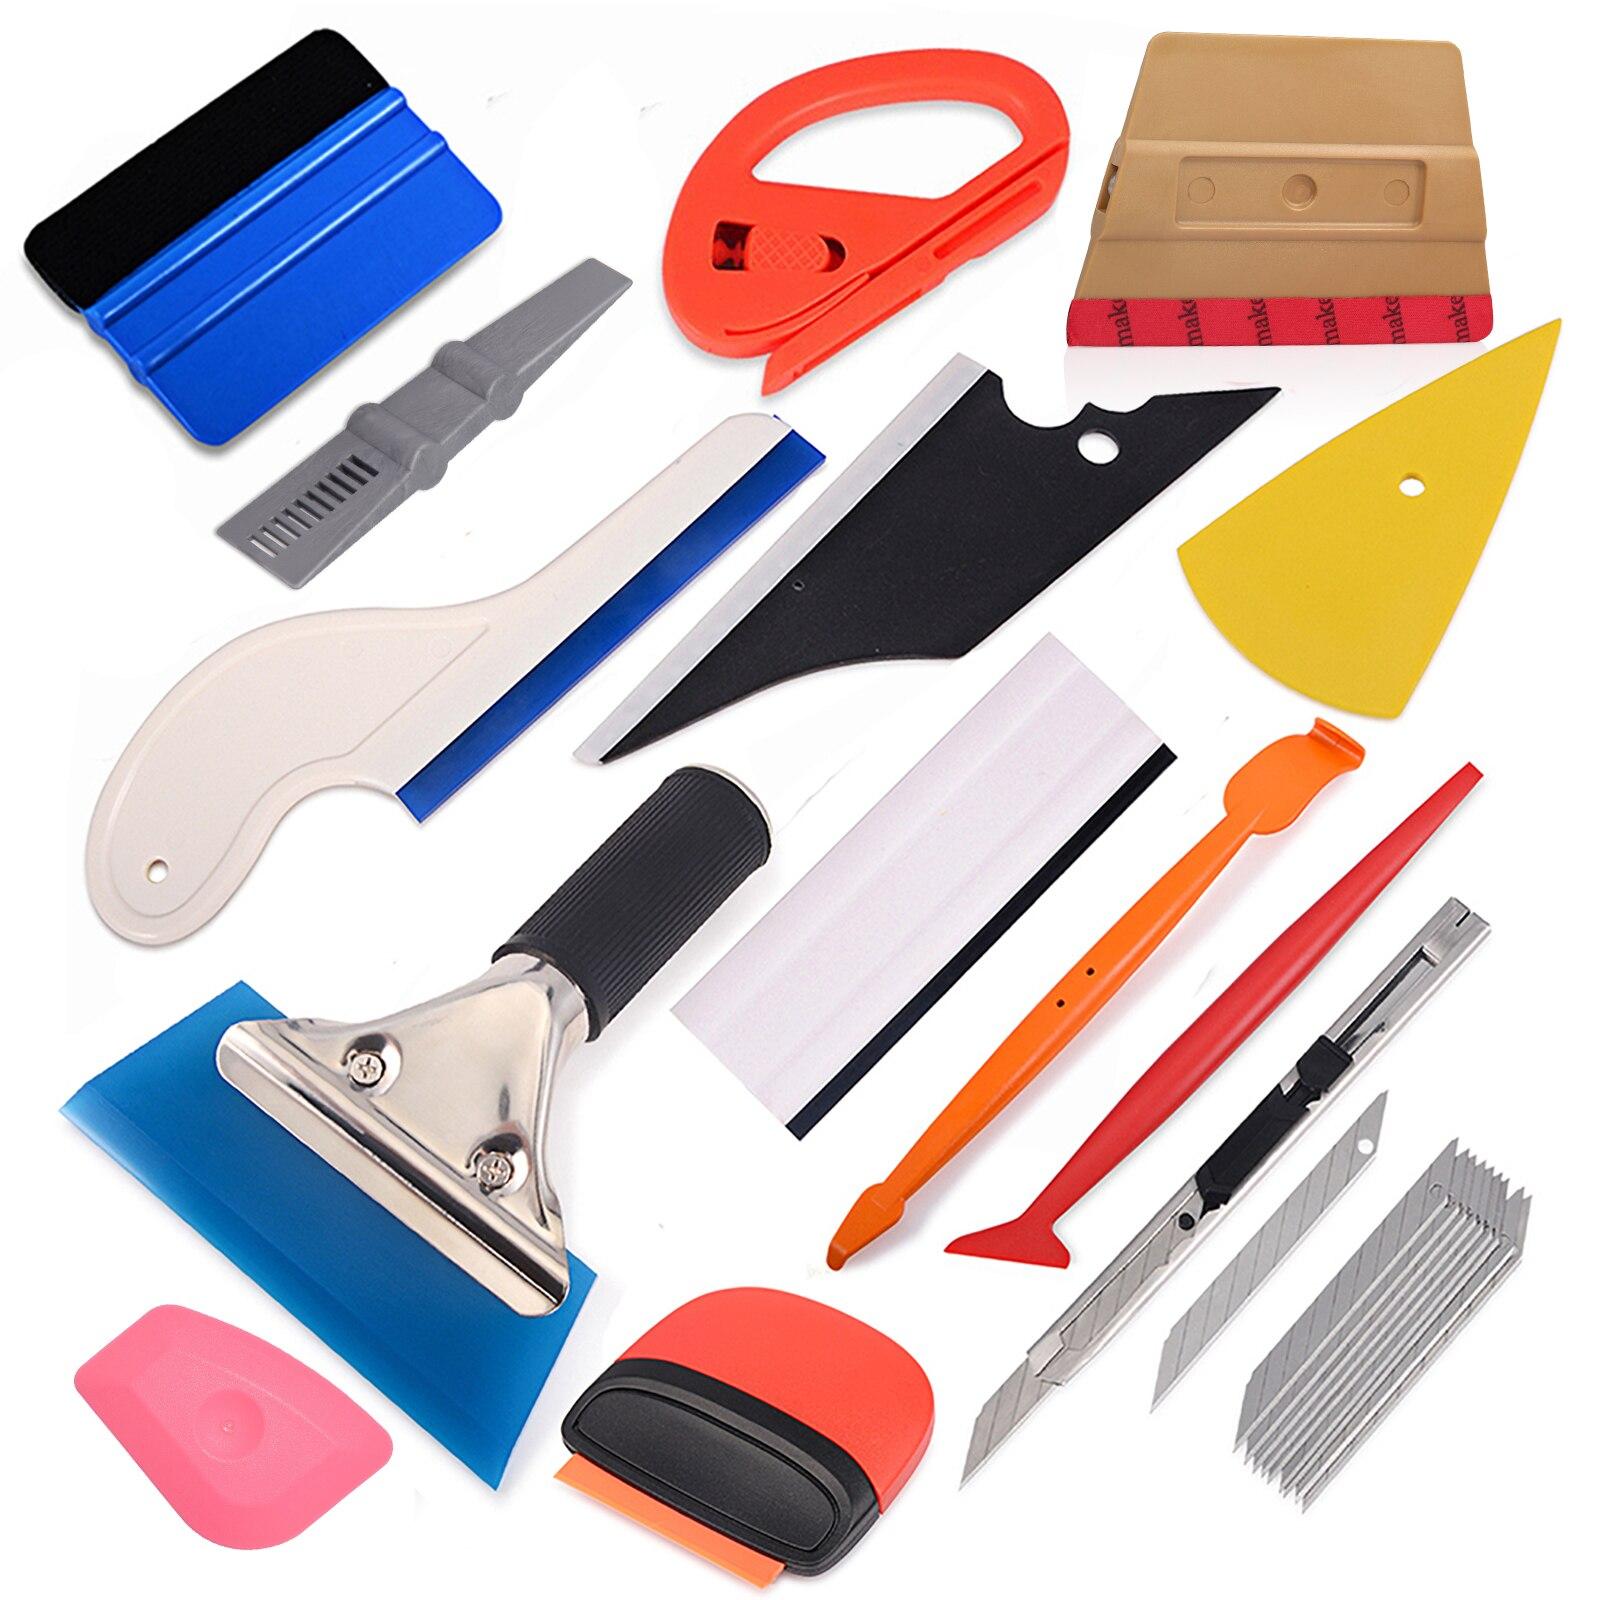 FOSHIO Vinyl Wrap Car Carbon Fiber Magnet Squeegee Window Tint Rubber Scraper Sticker Cutter Knife Tool Set Wrapping Accessories